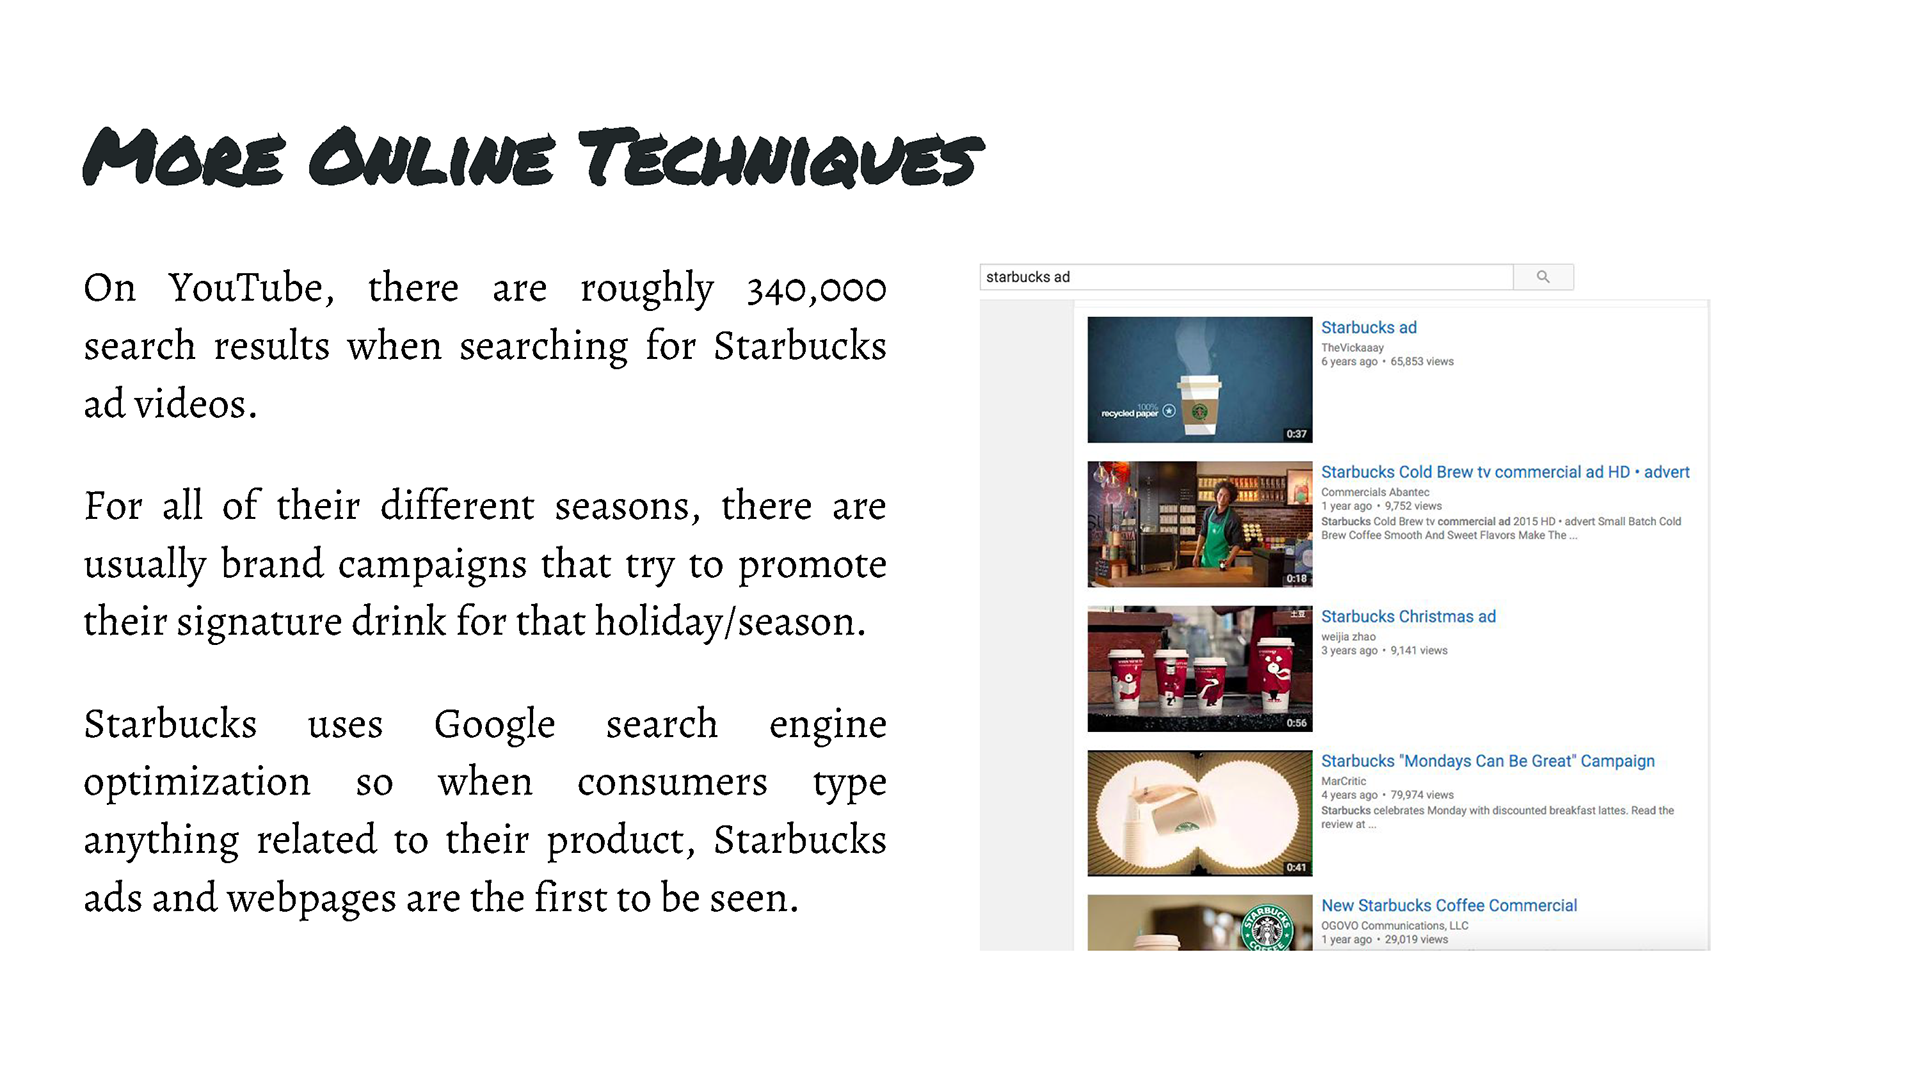 Morgan Bayne - Starbucks